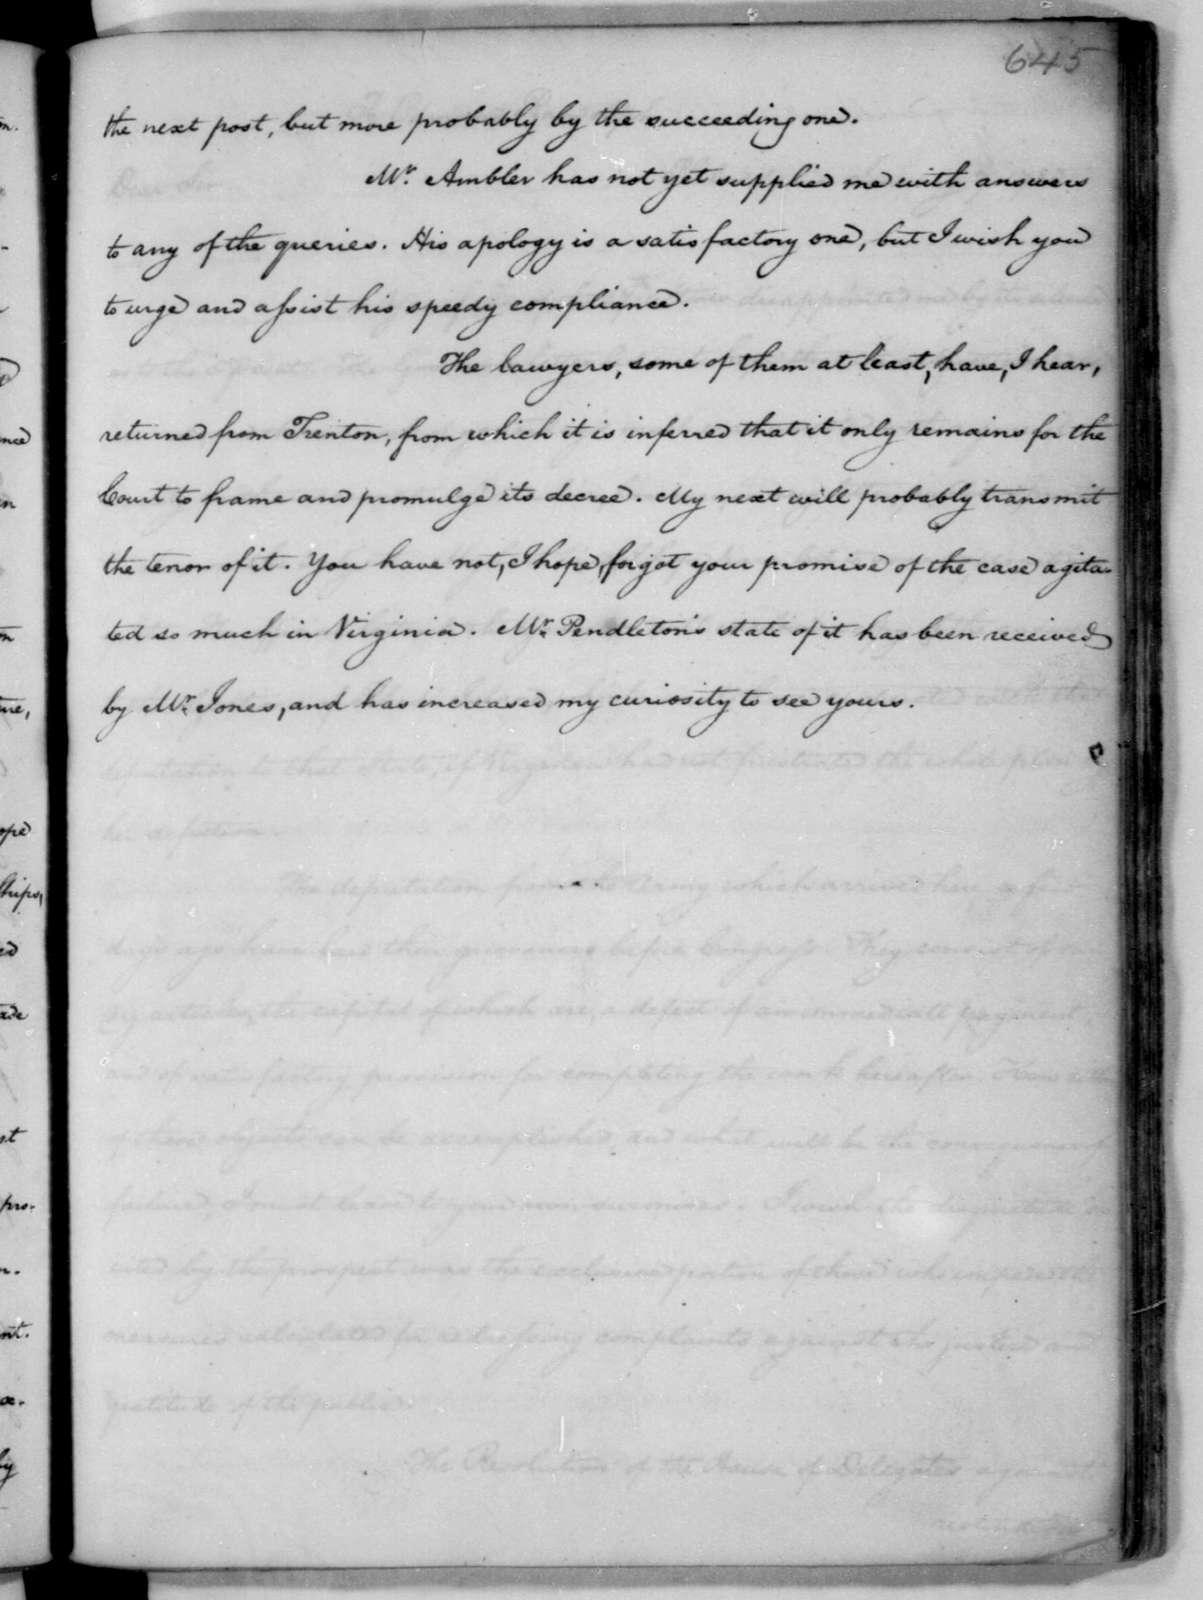 James Madison to Edmund Randolph, December 30, 1782.